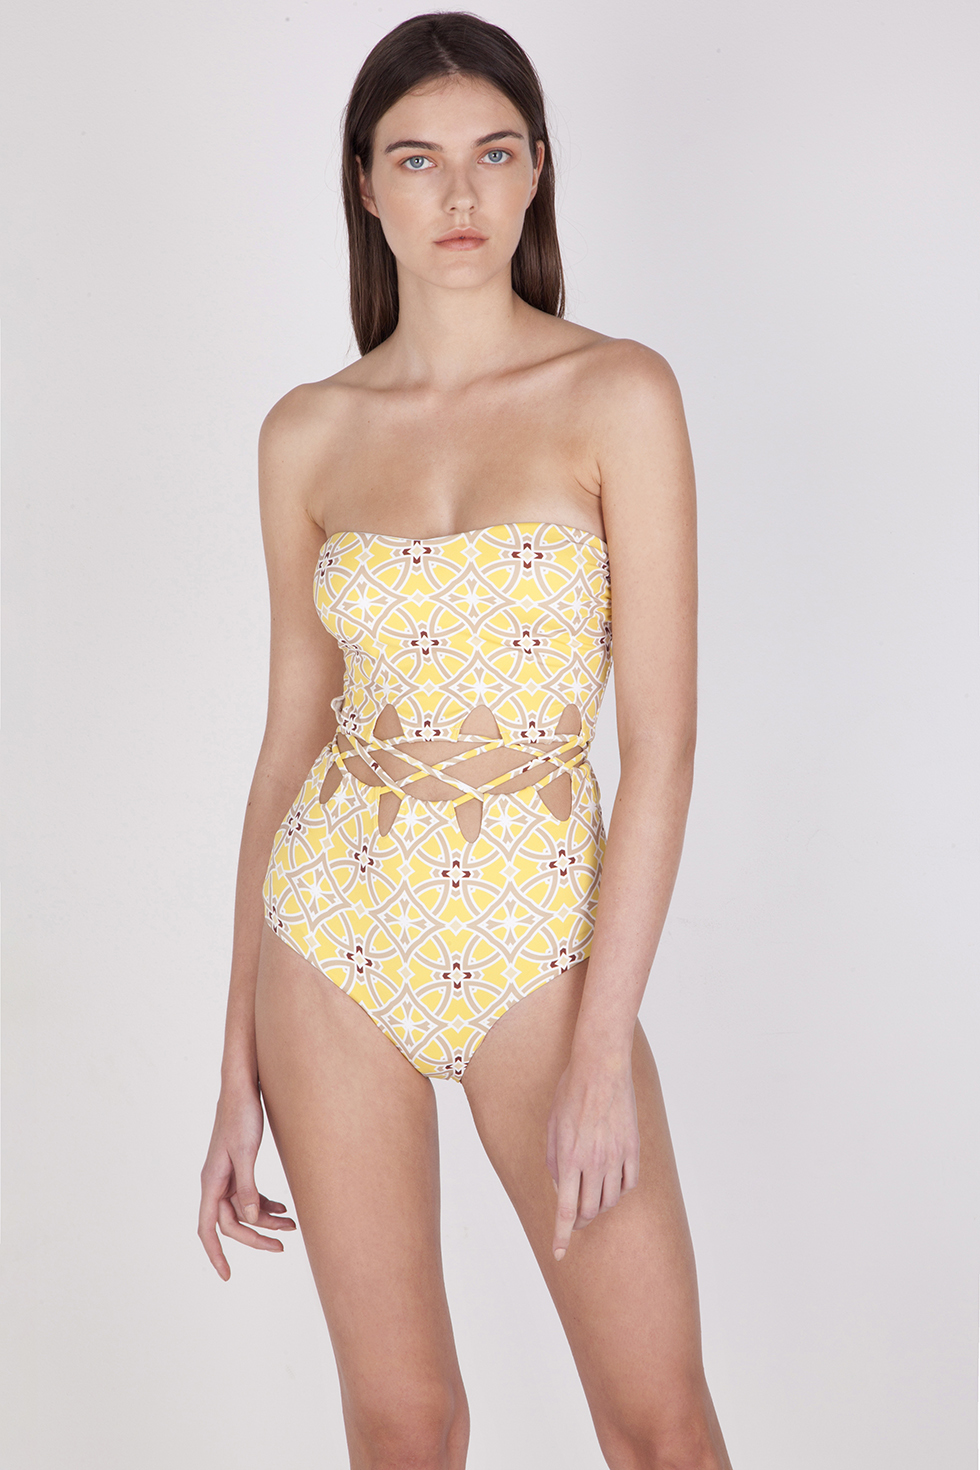 c95055e9b71 Γυναικεία Ολόσωμα Μαγιό - Φθηνότερα Προϊόντα - Σελίδα 20 | bikinishop.gr